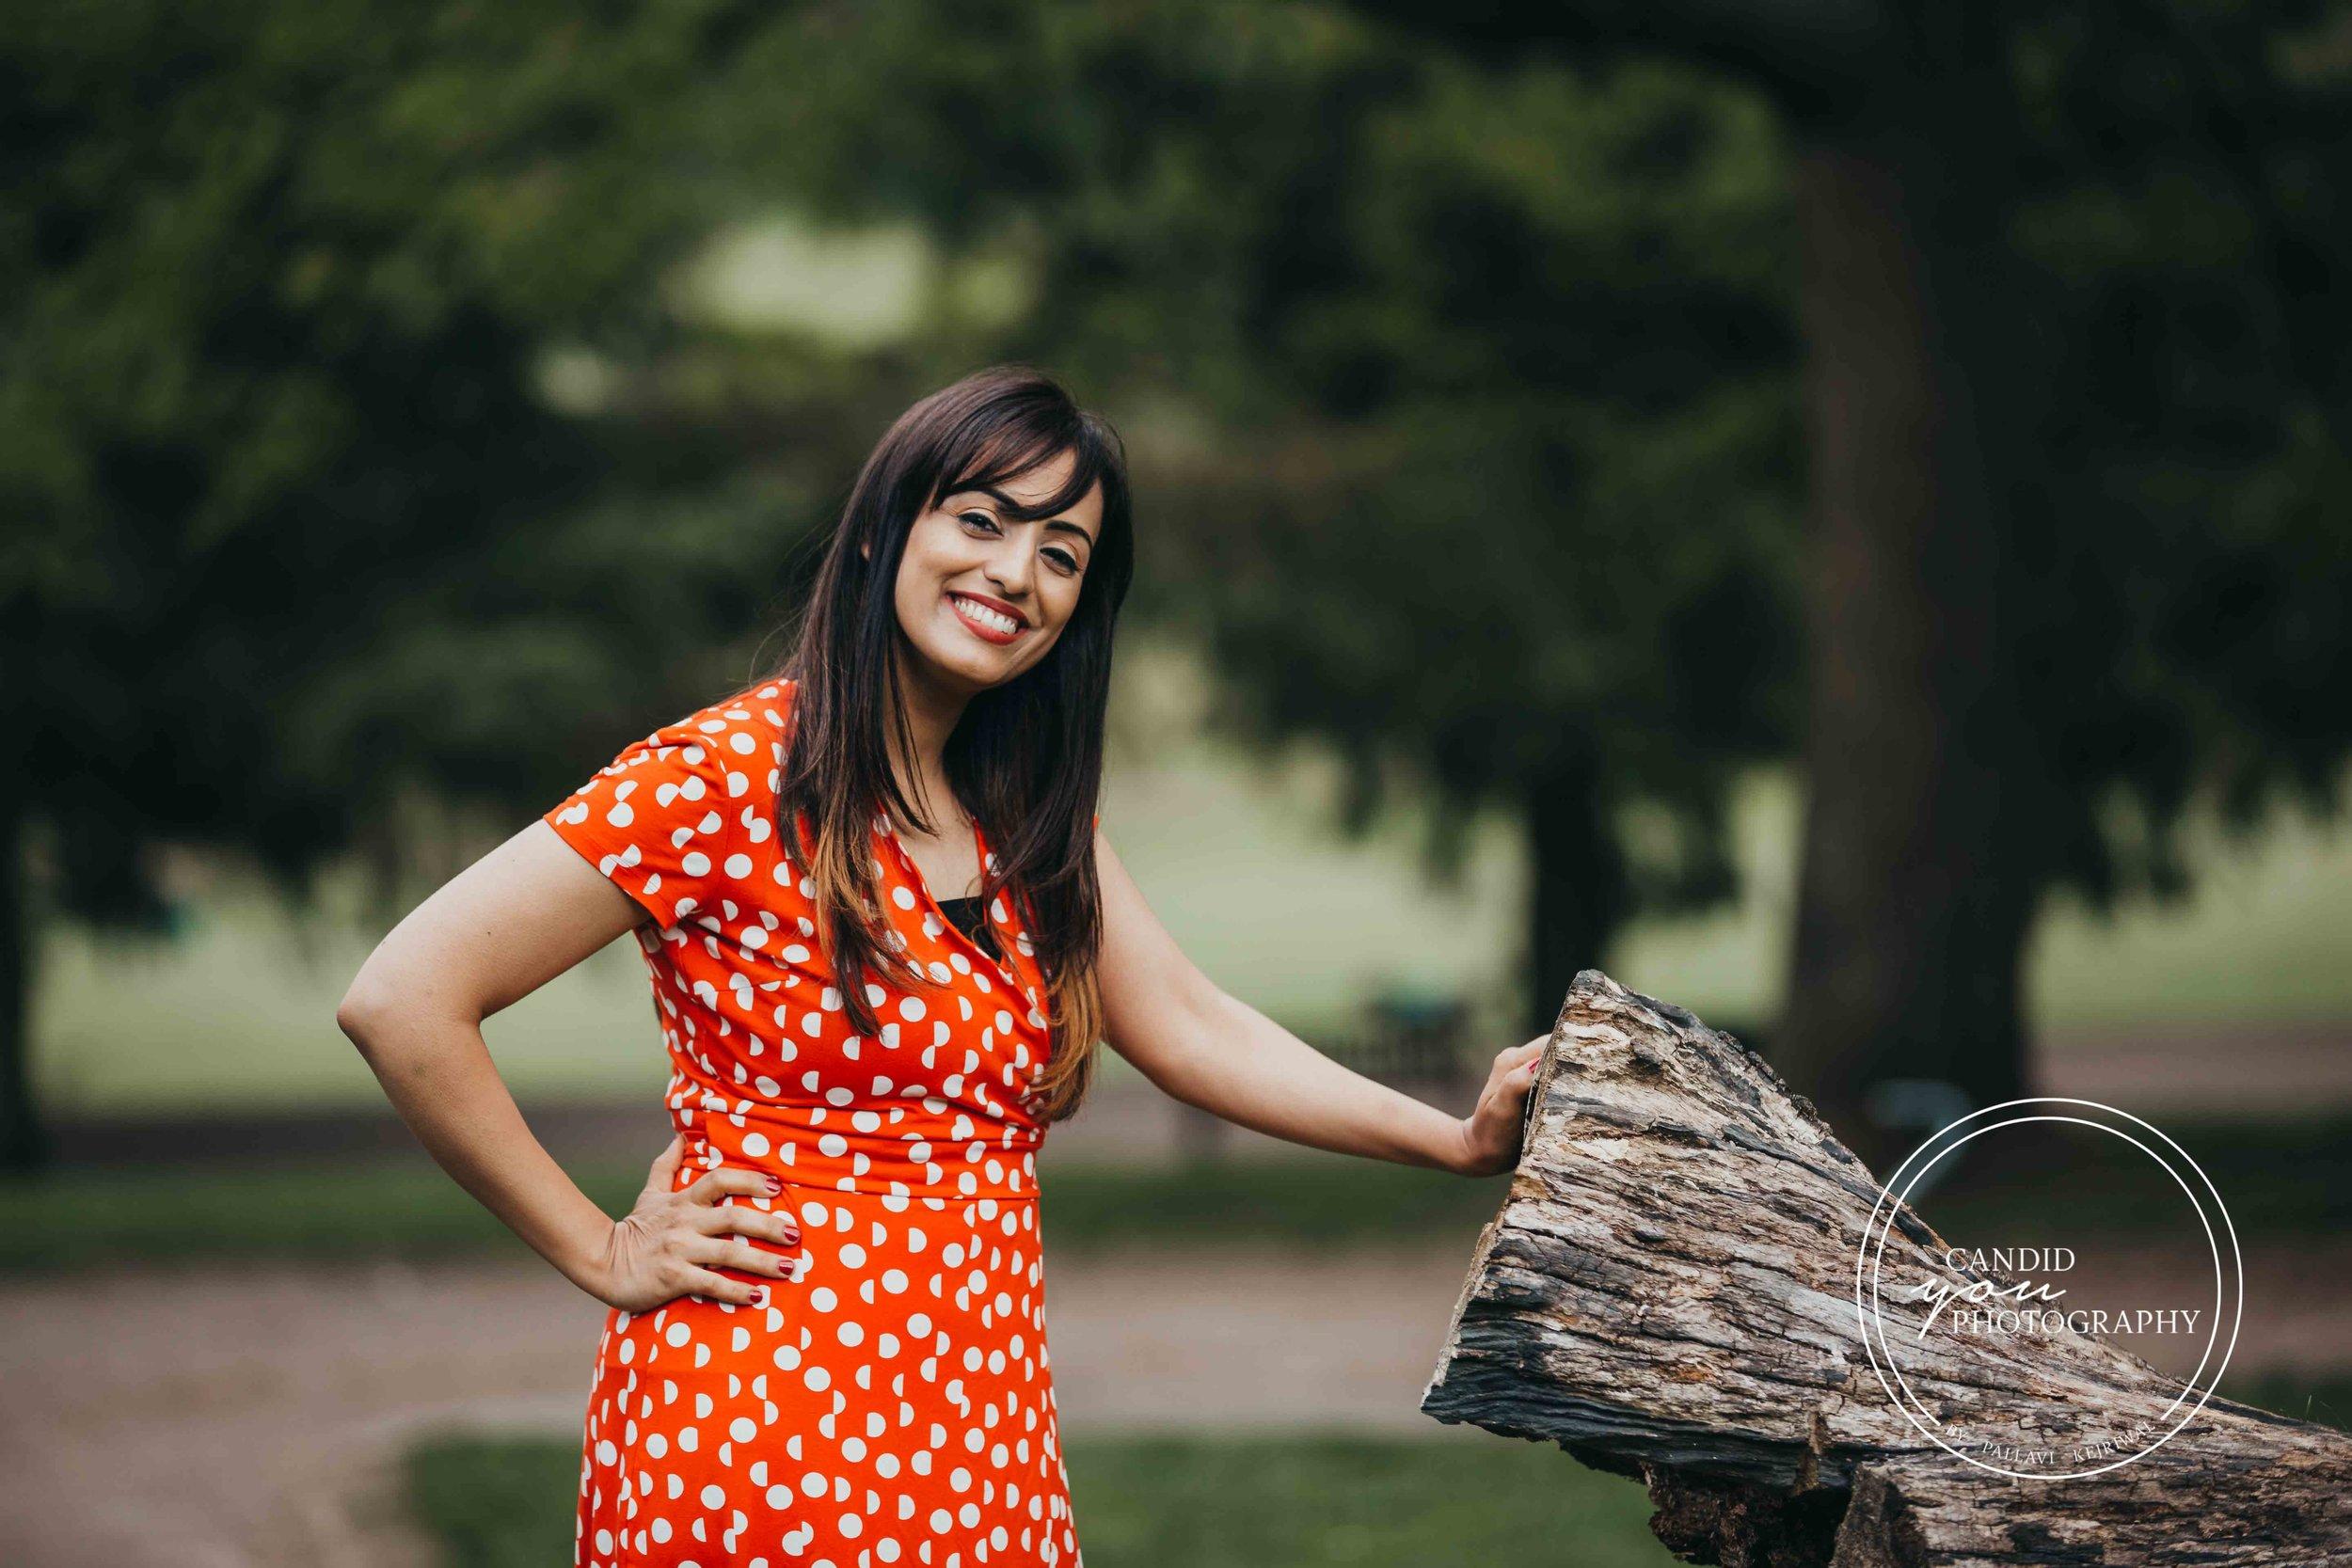 Beautiful woman in orange polka dot dress in park